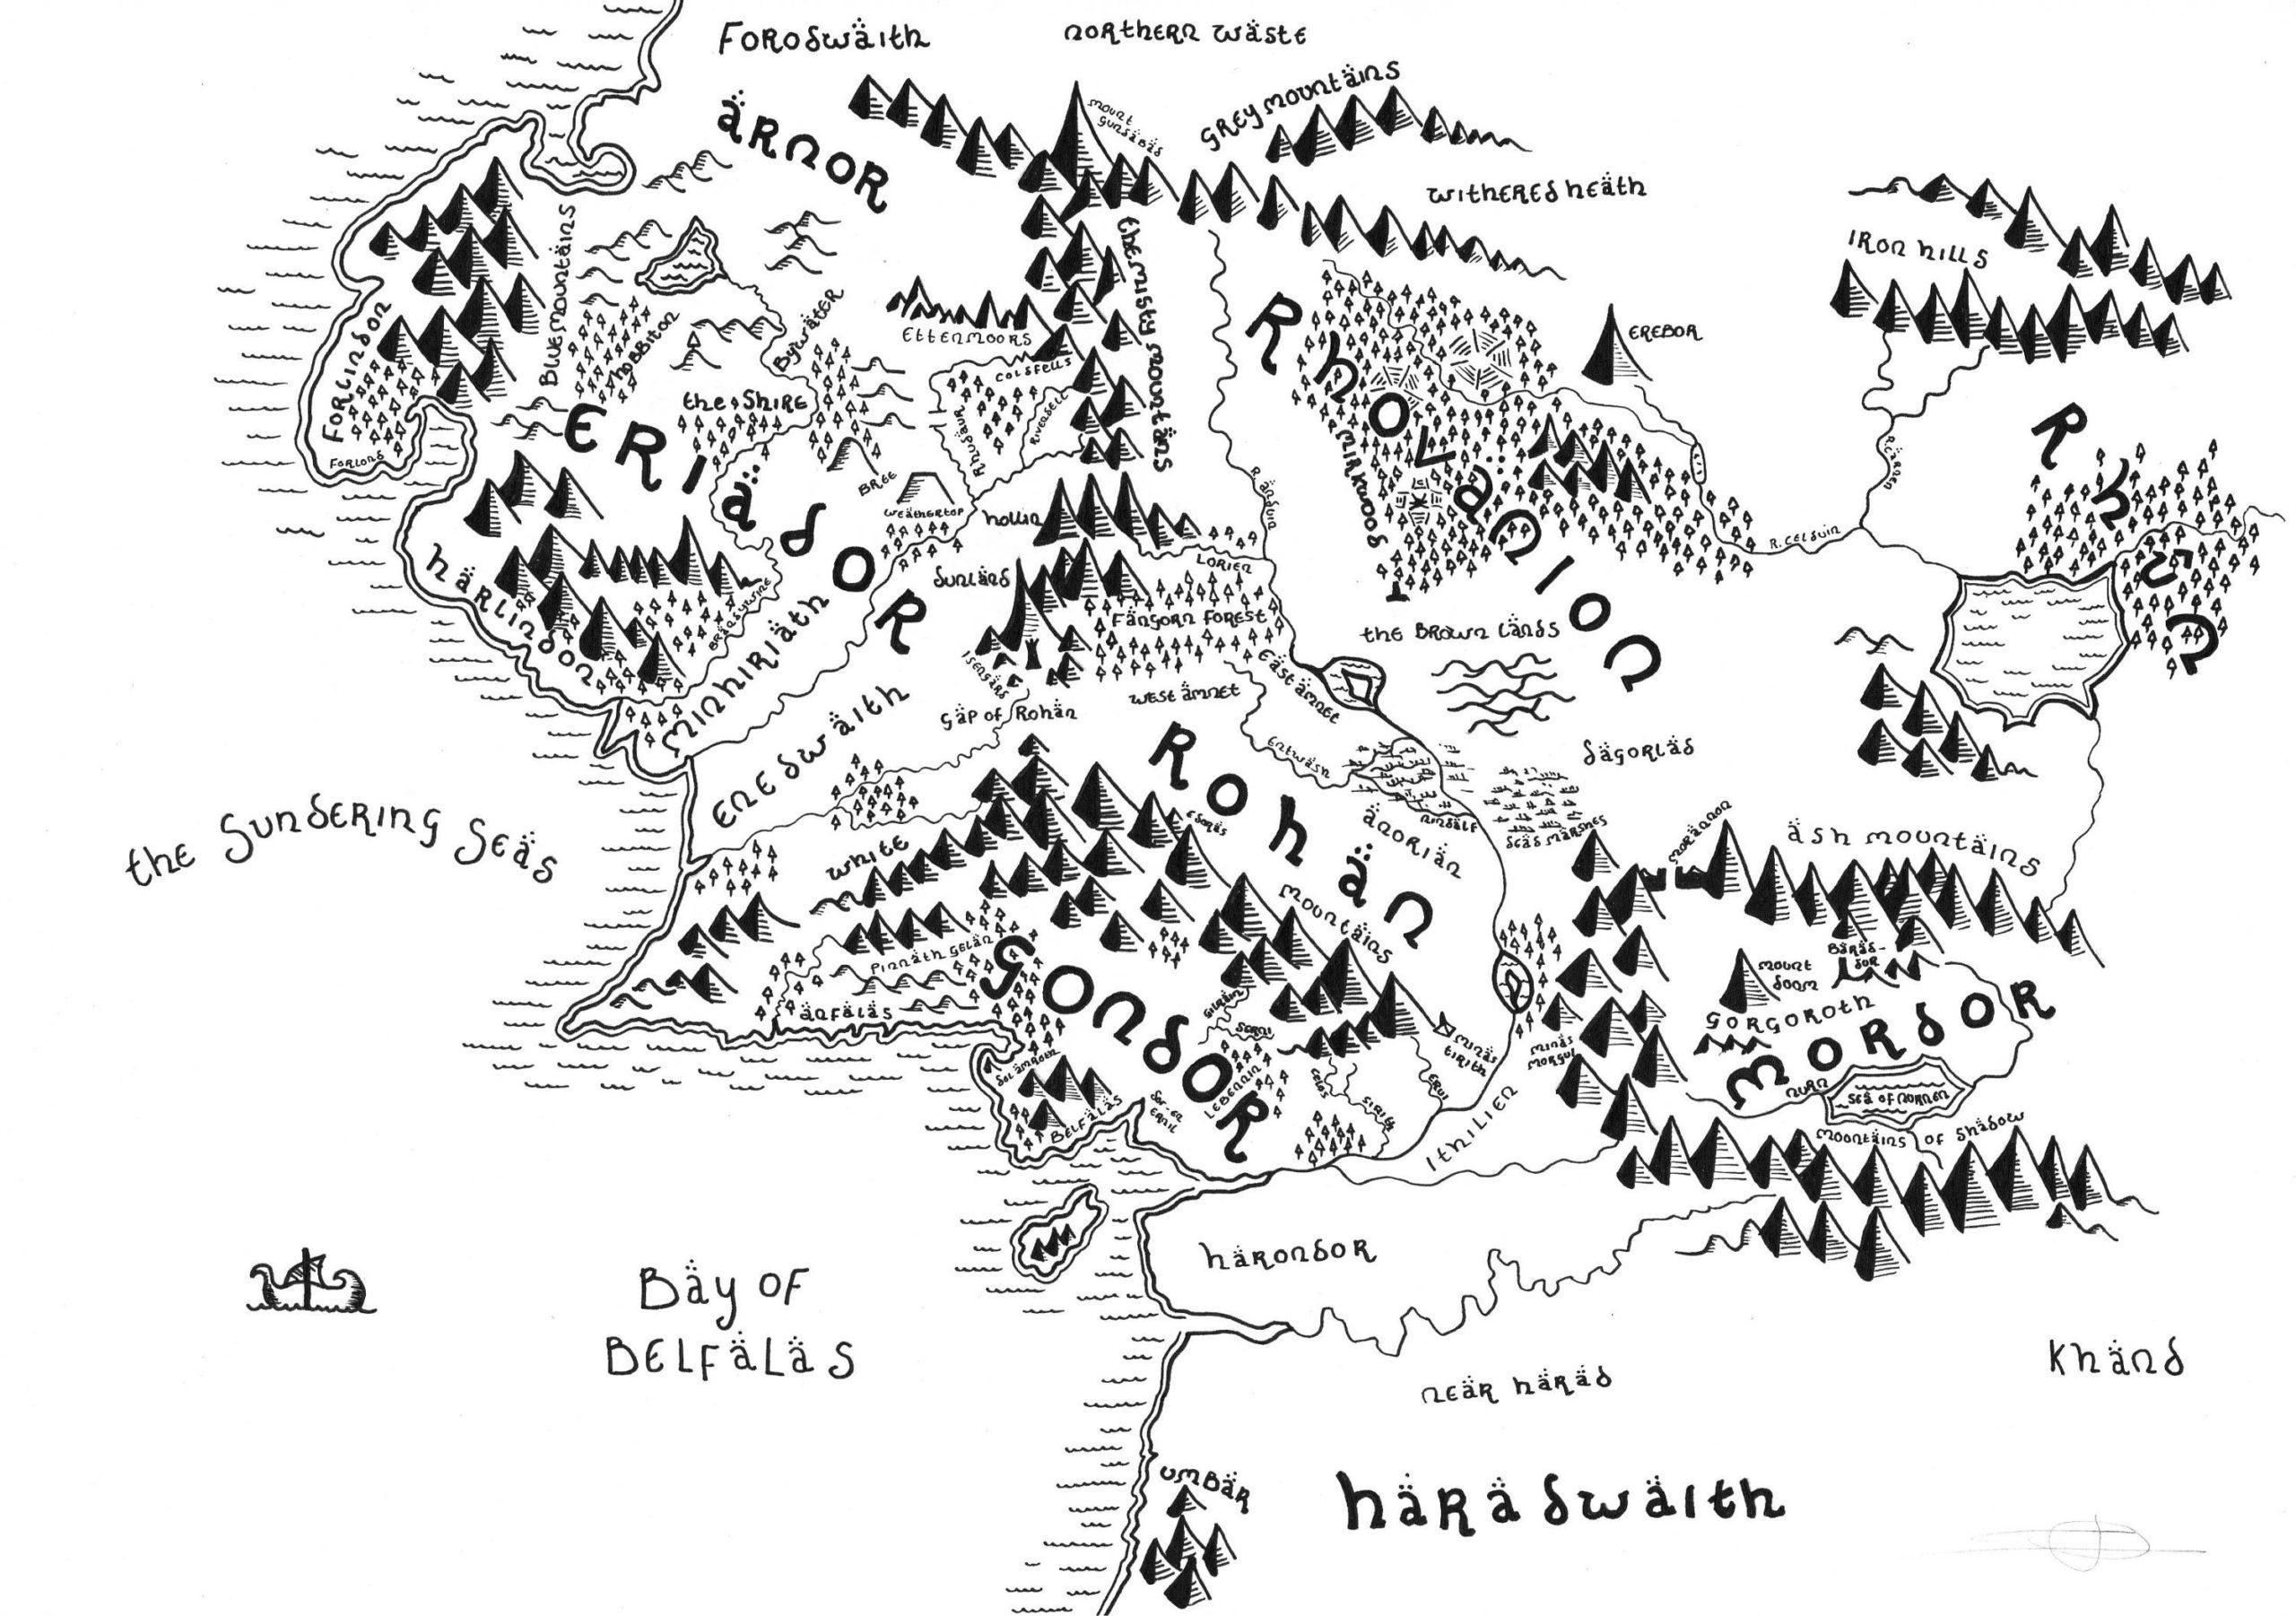 Cart grafo Amador Desenvolve Mapas Inspirados No Estilo De